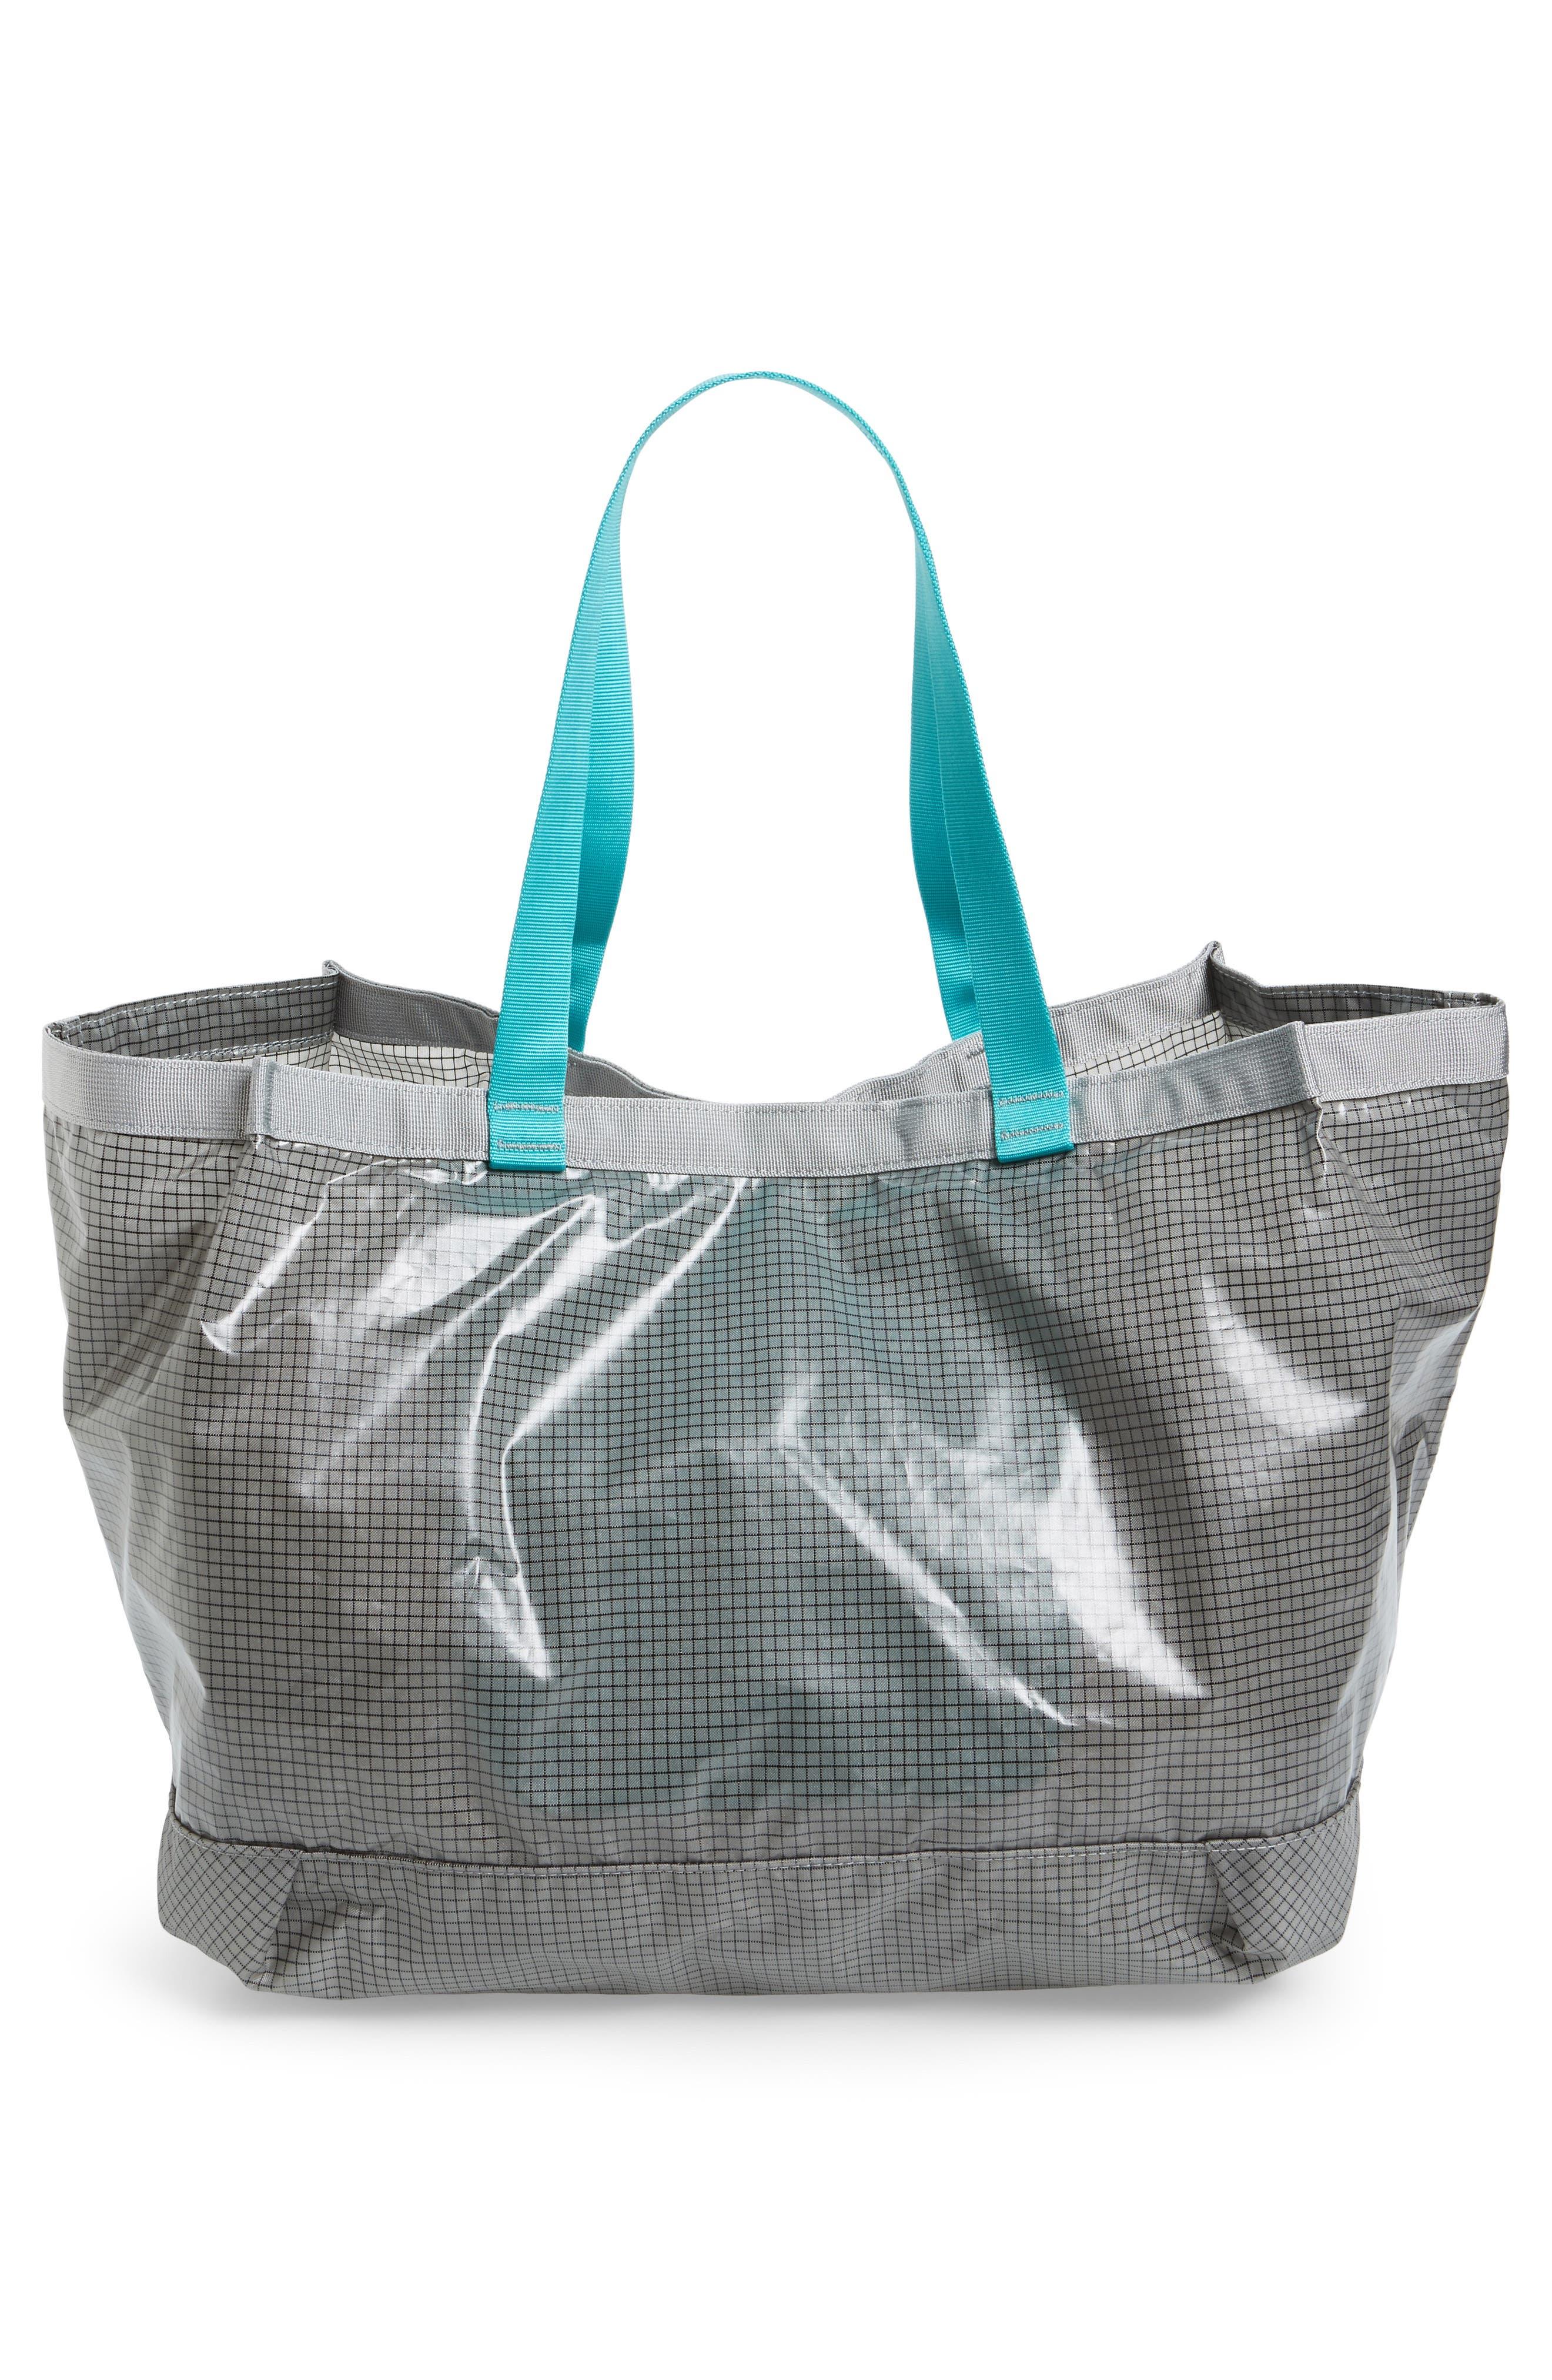 Lightweight Black Hole Gear Tote Bag,                             Alternate thumbnail 3, color,                             020